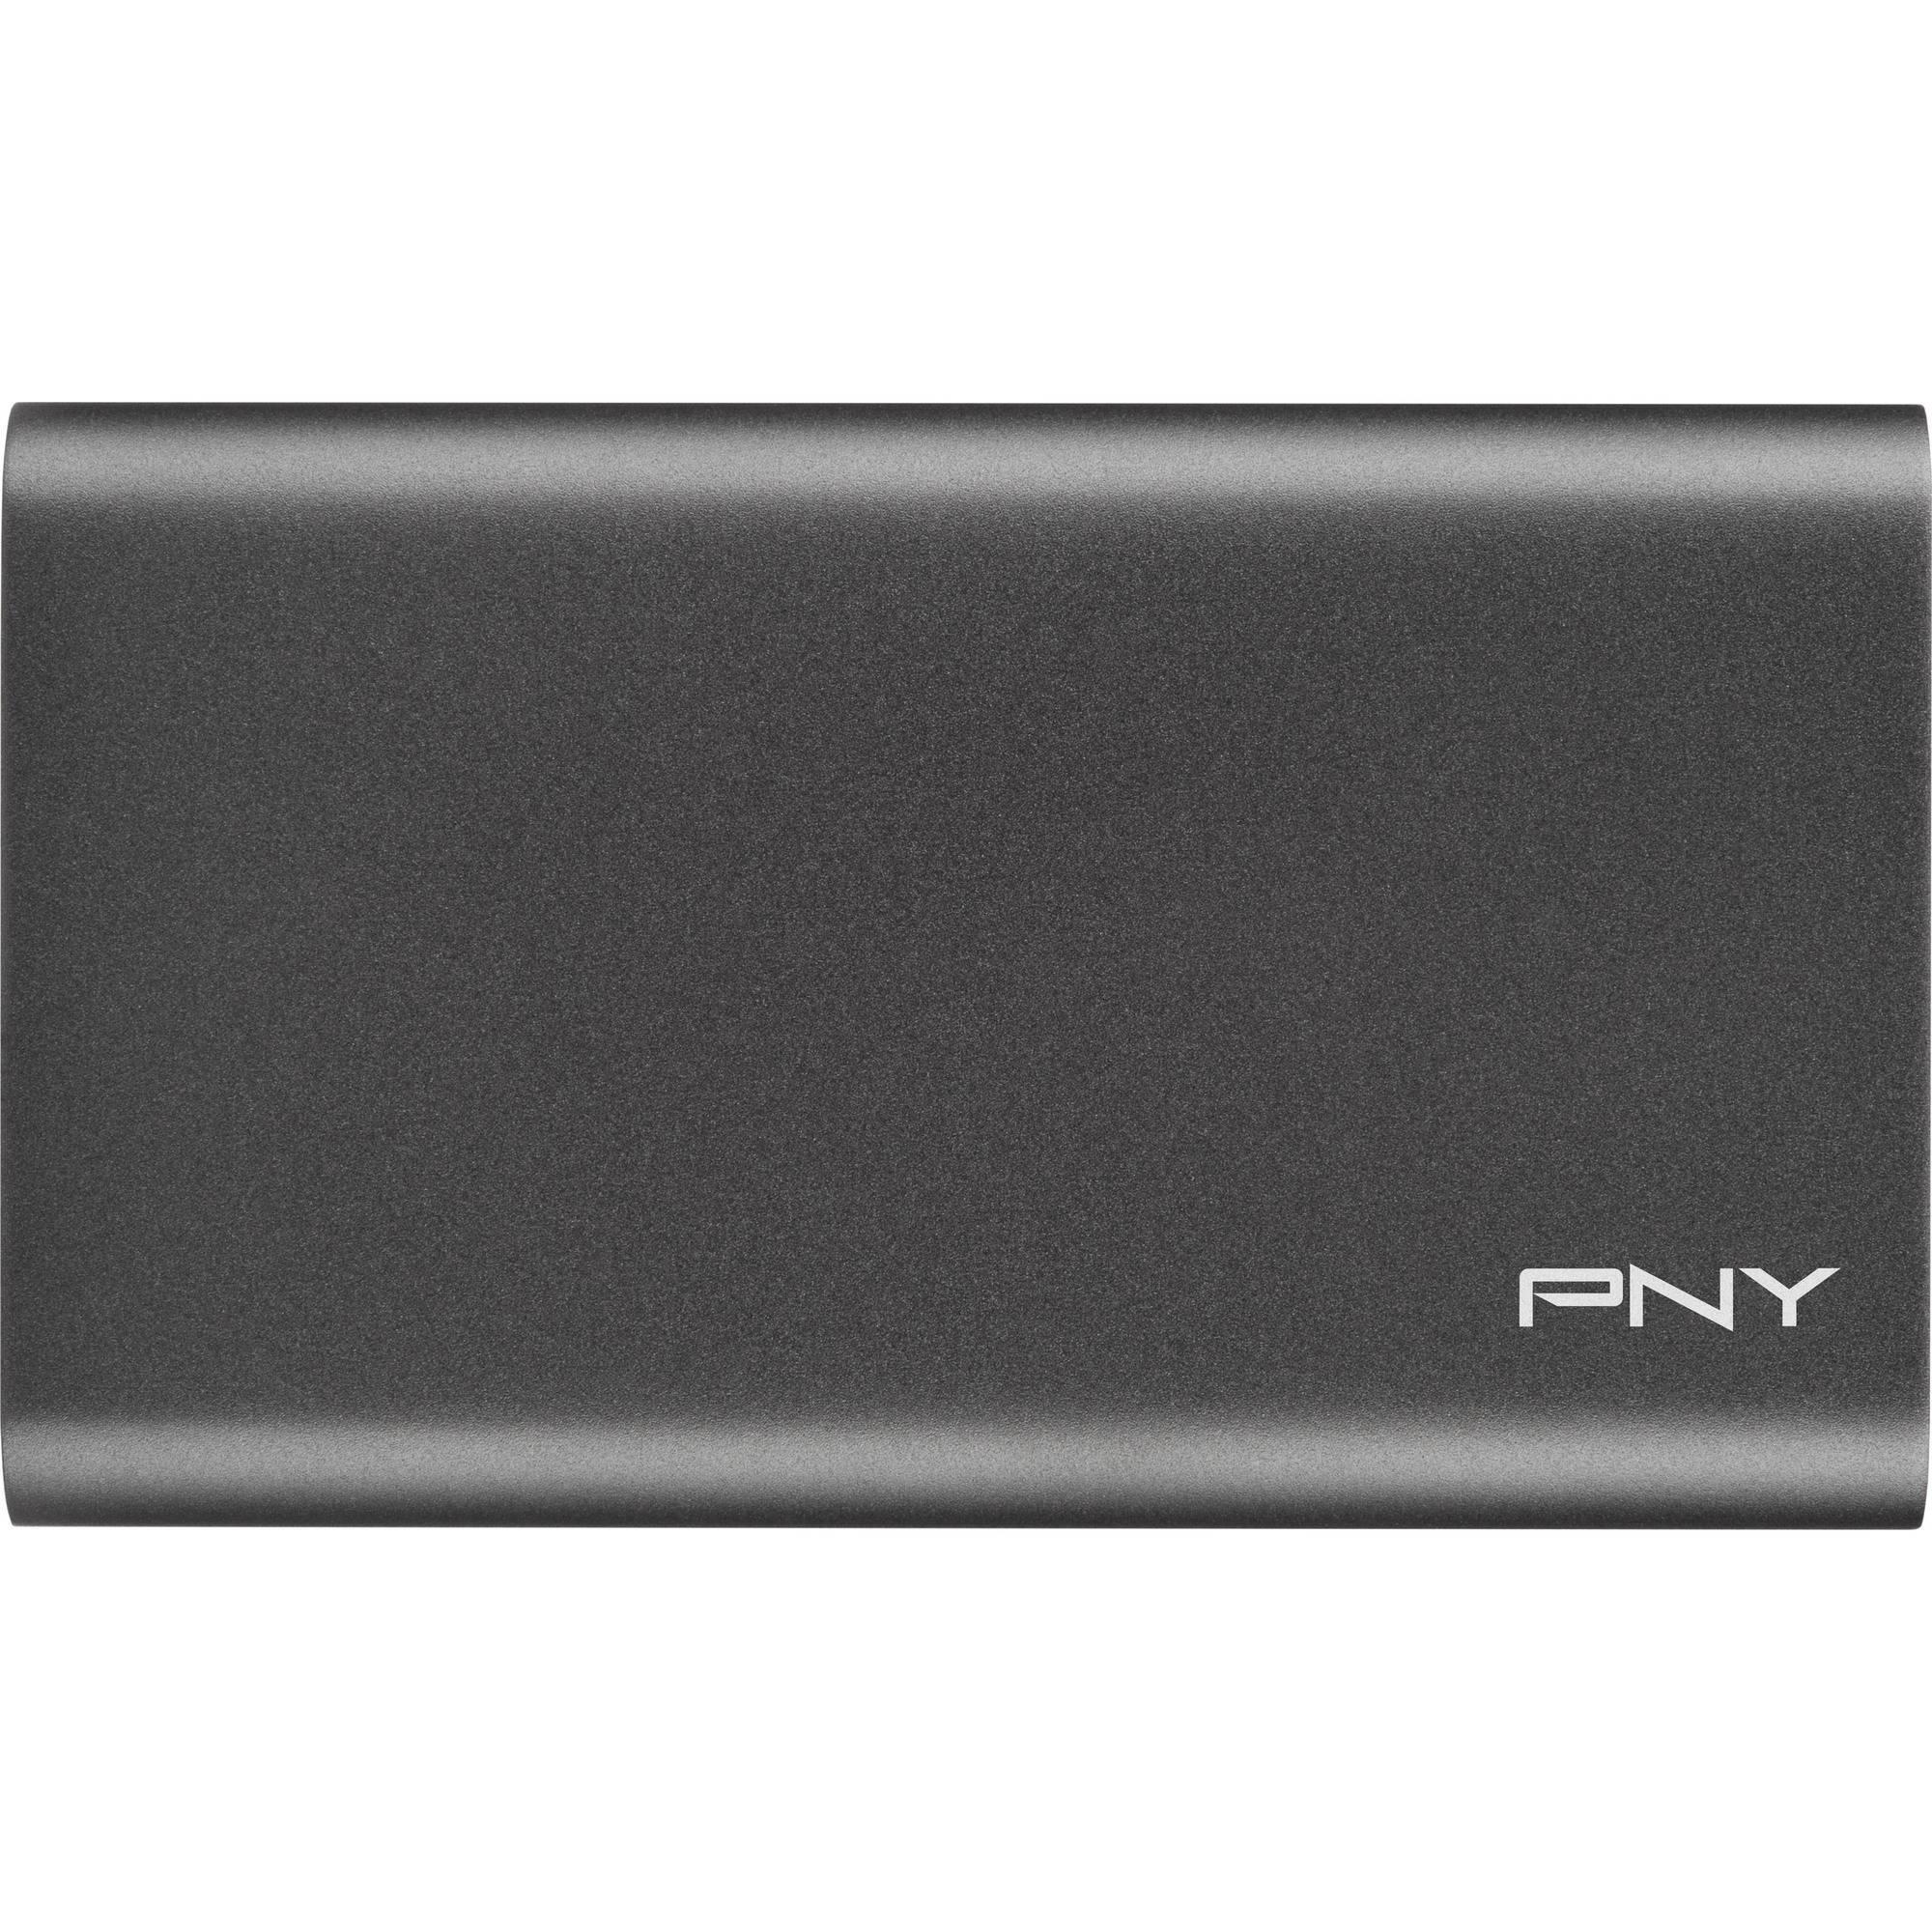 PNY Technologies 480GB Elite Portable SSD $15 YMMV Walmart